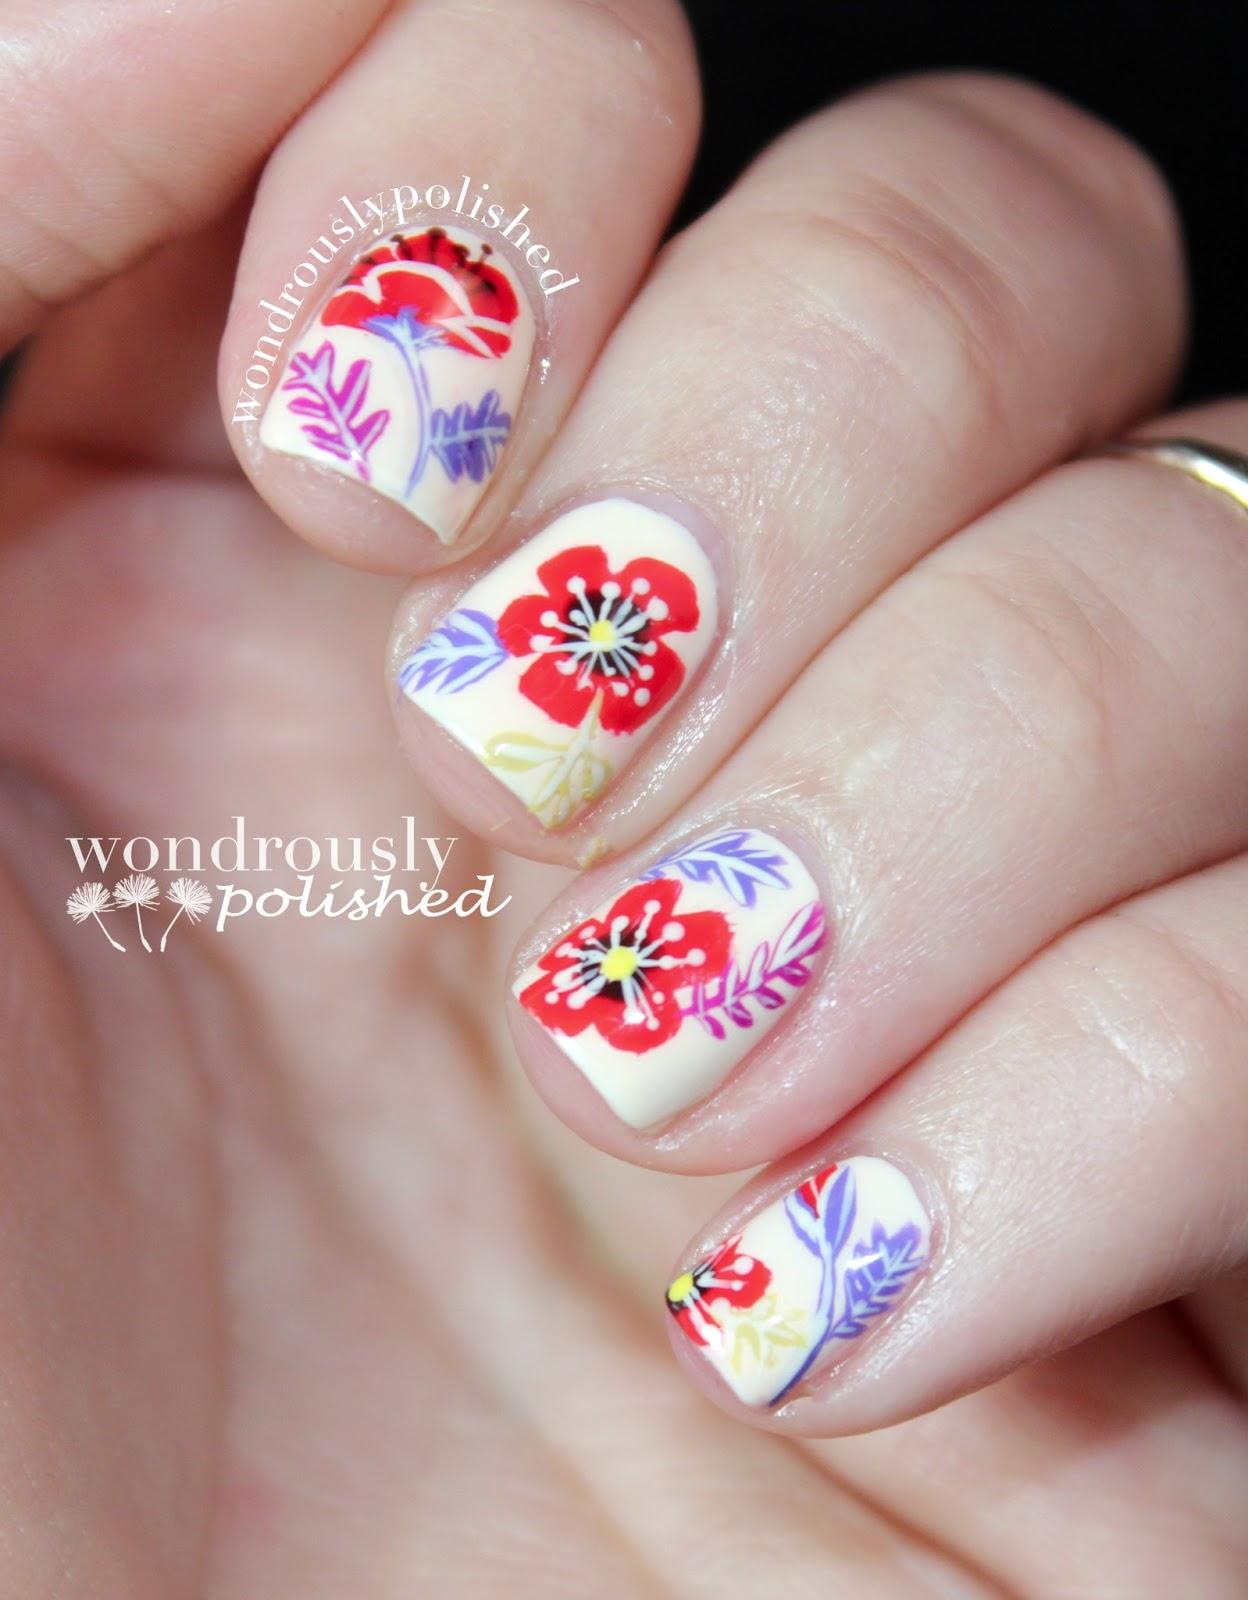 Wondrously Polished April Nail Art Challenge: Wondrously Polished: April Nail Art Challenge